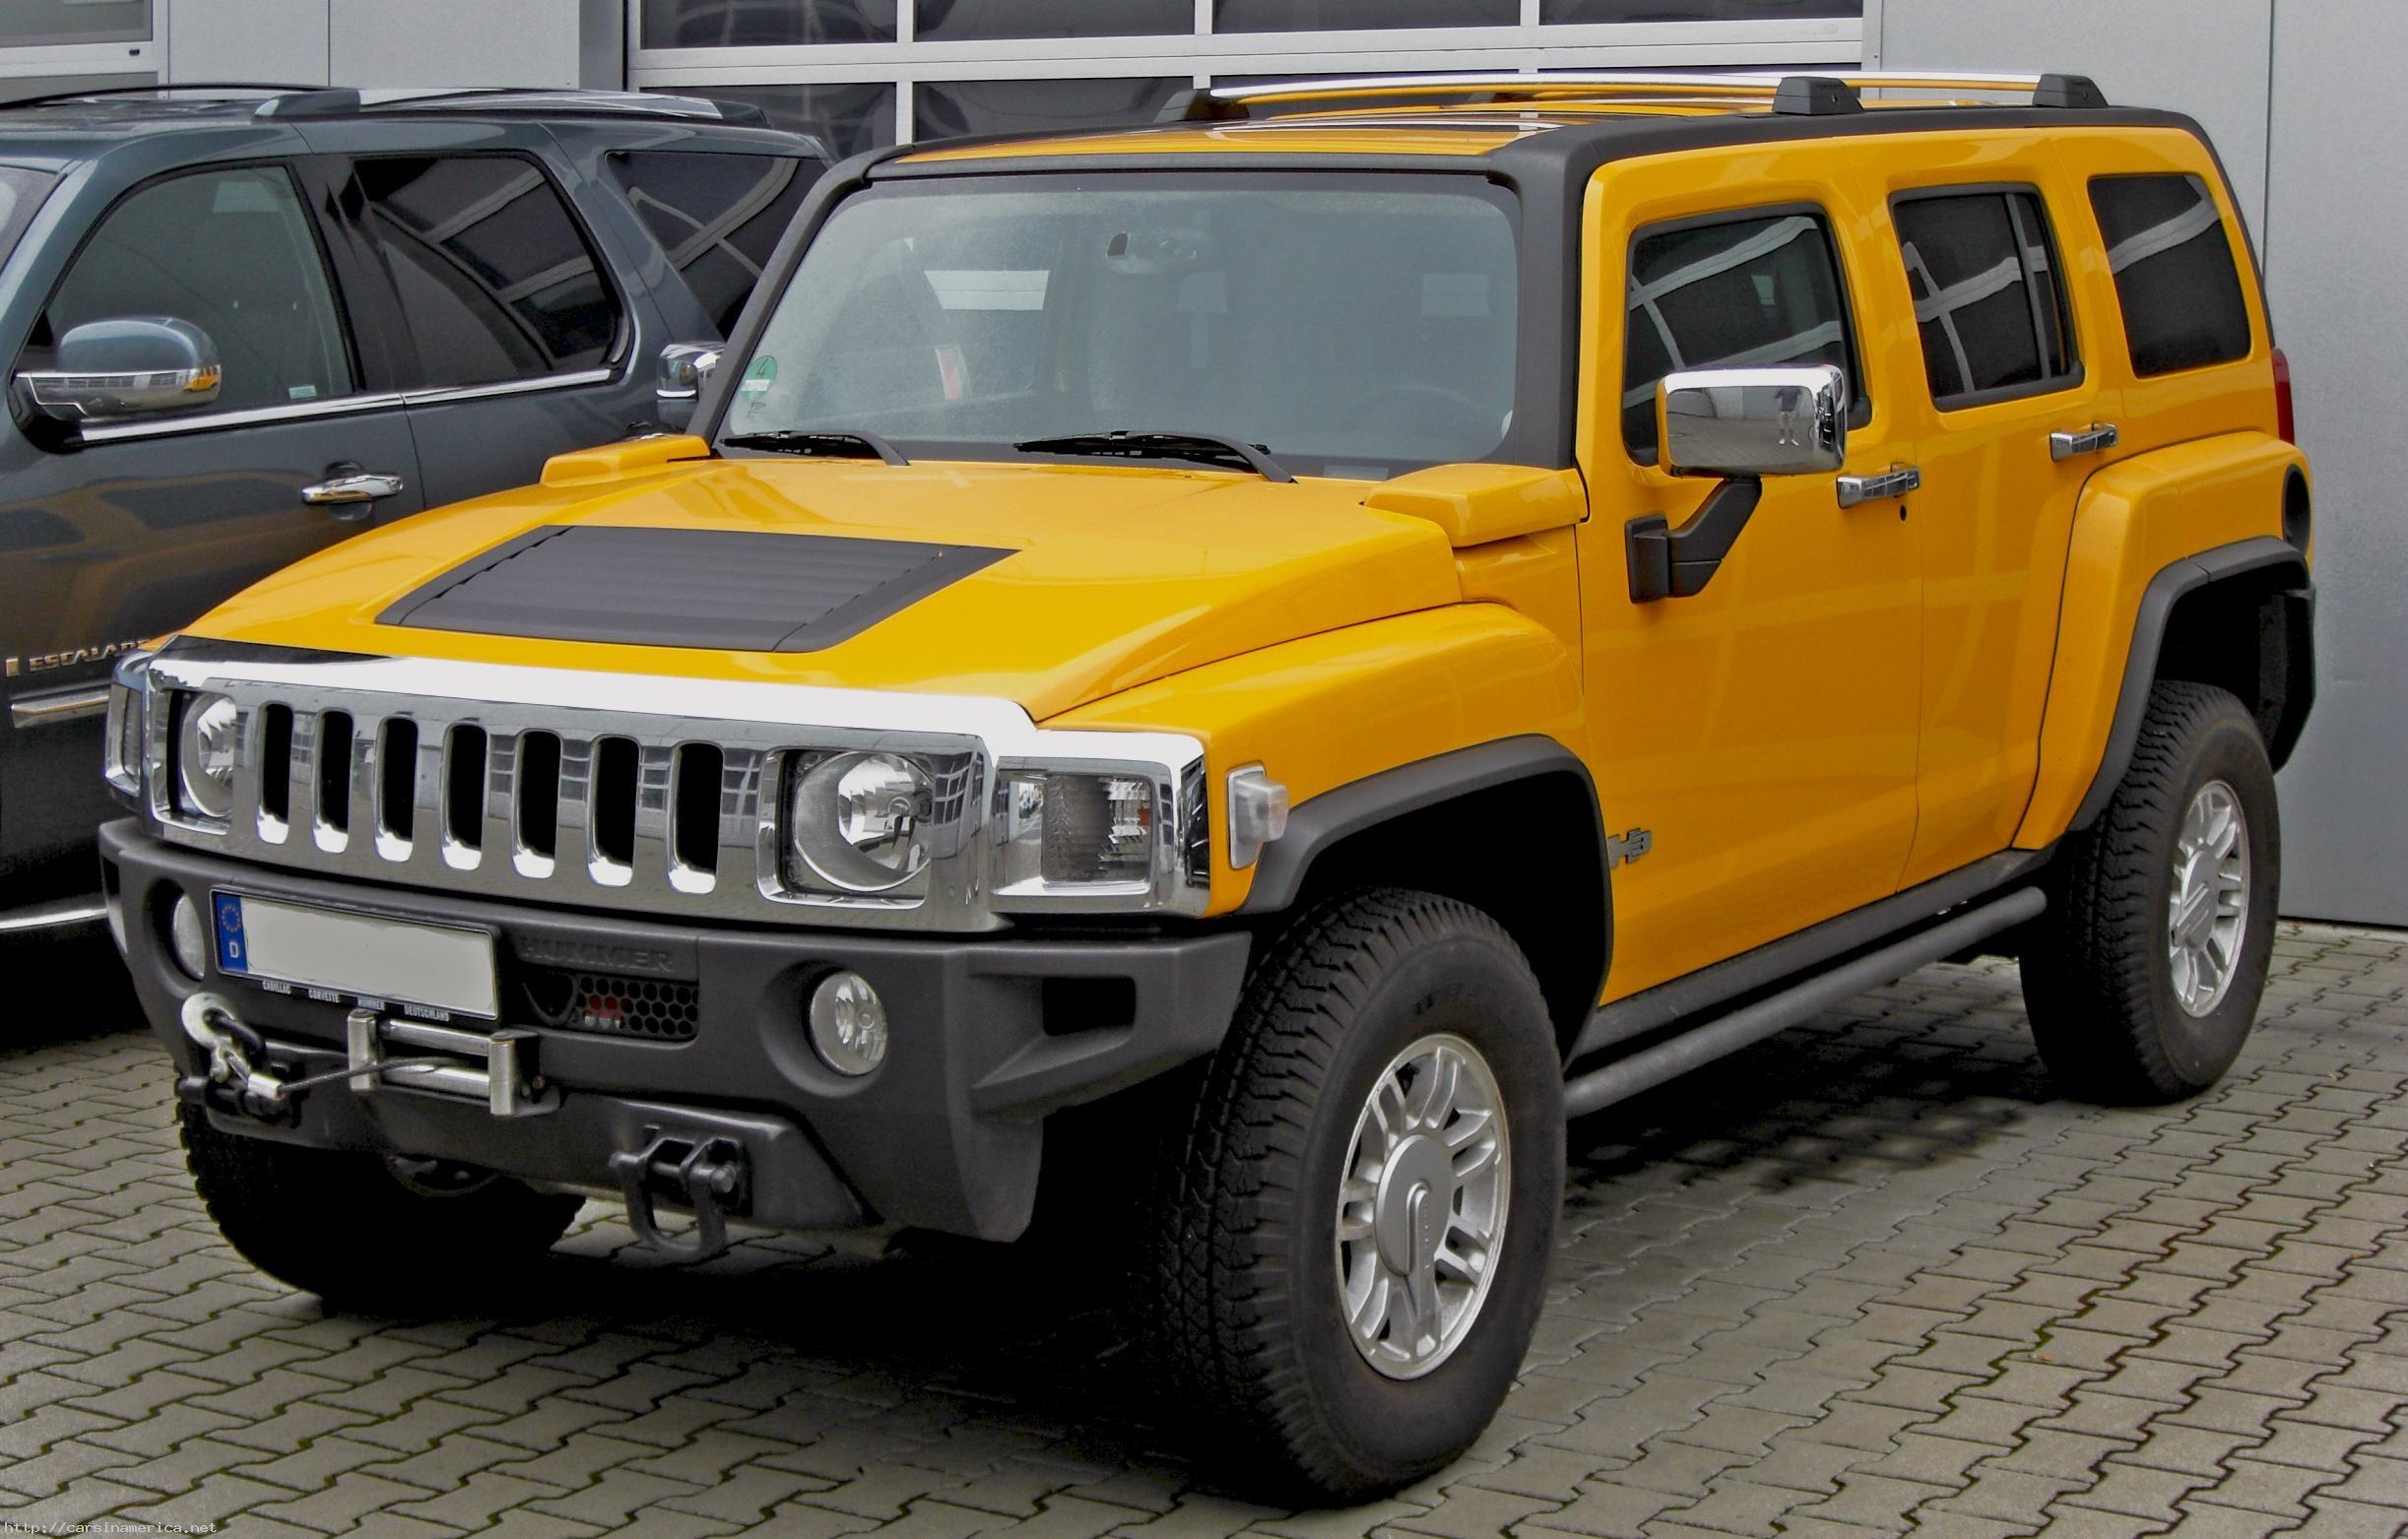 H3 Hummer Price 2020 New Car Reviews Models